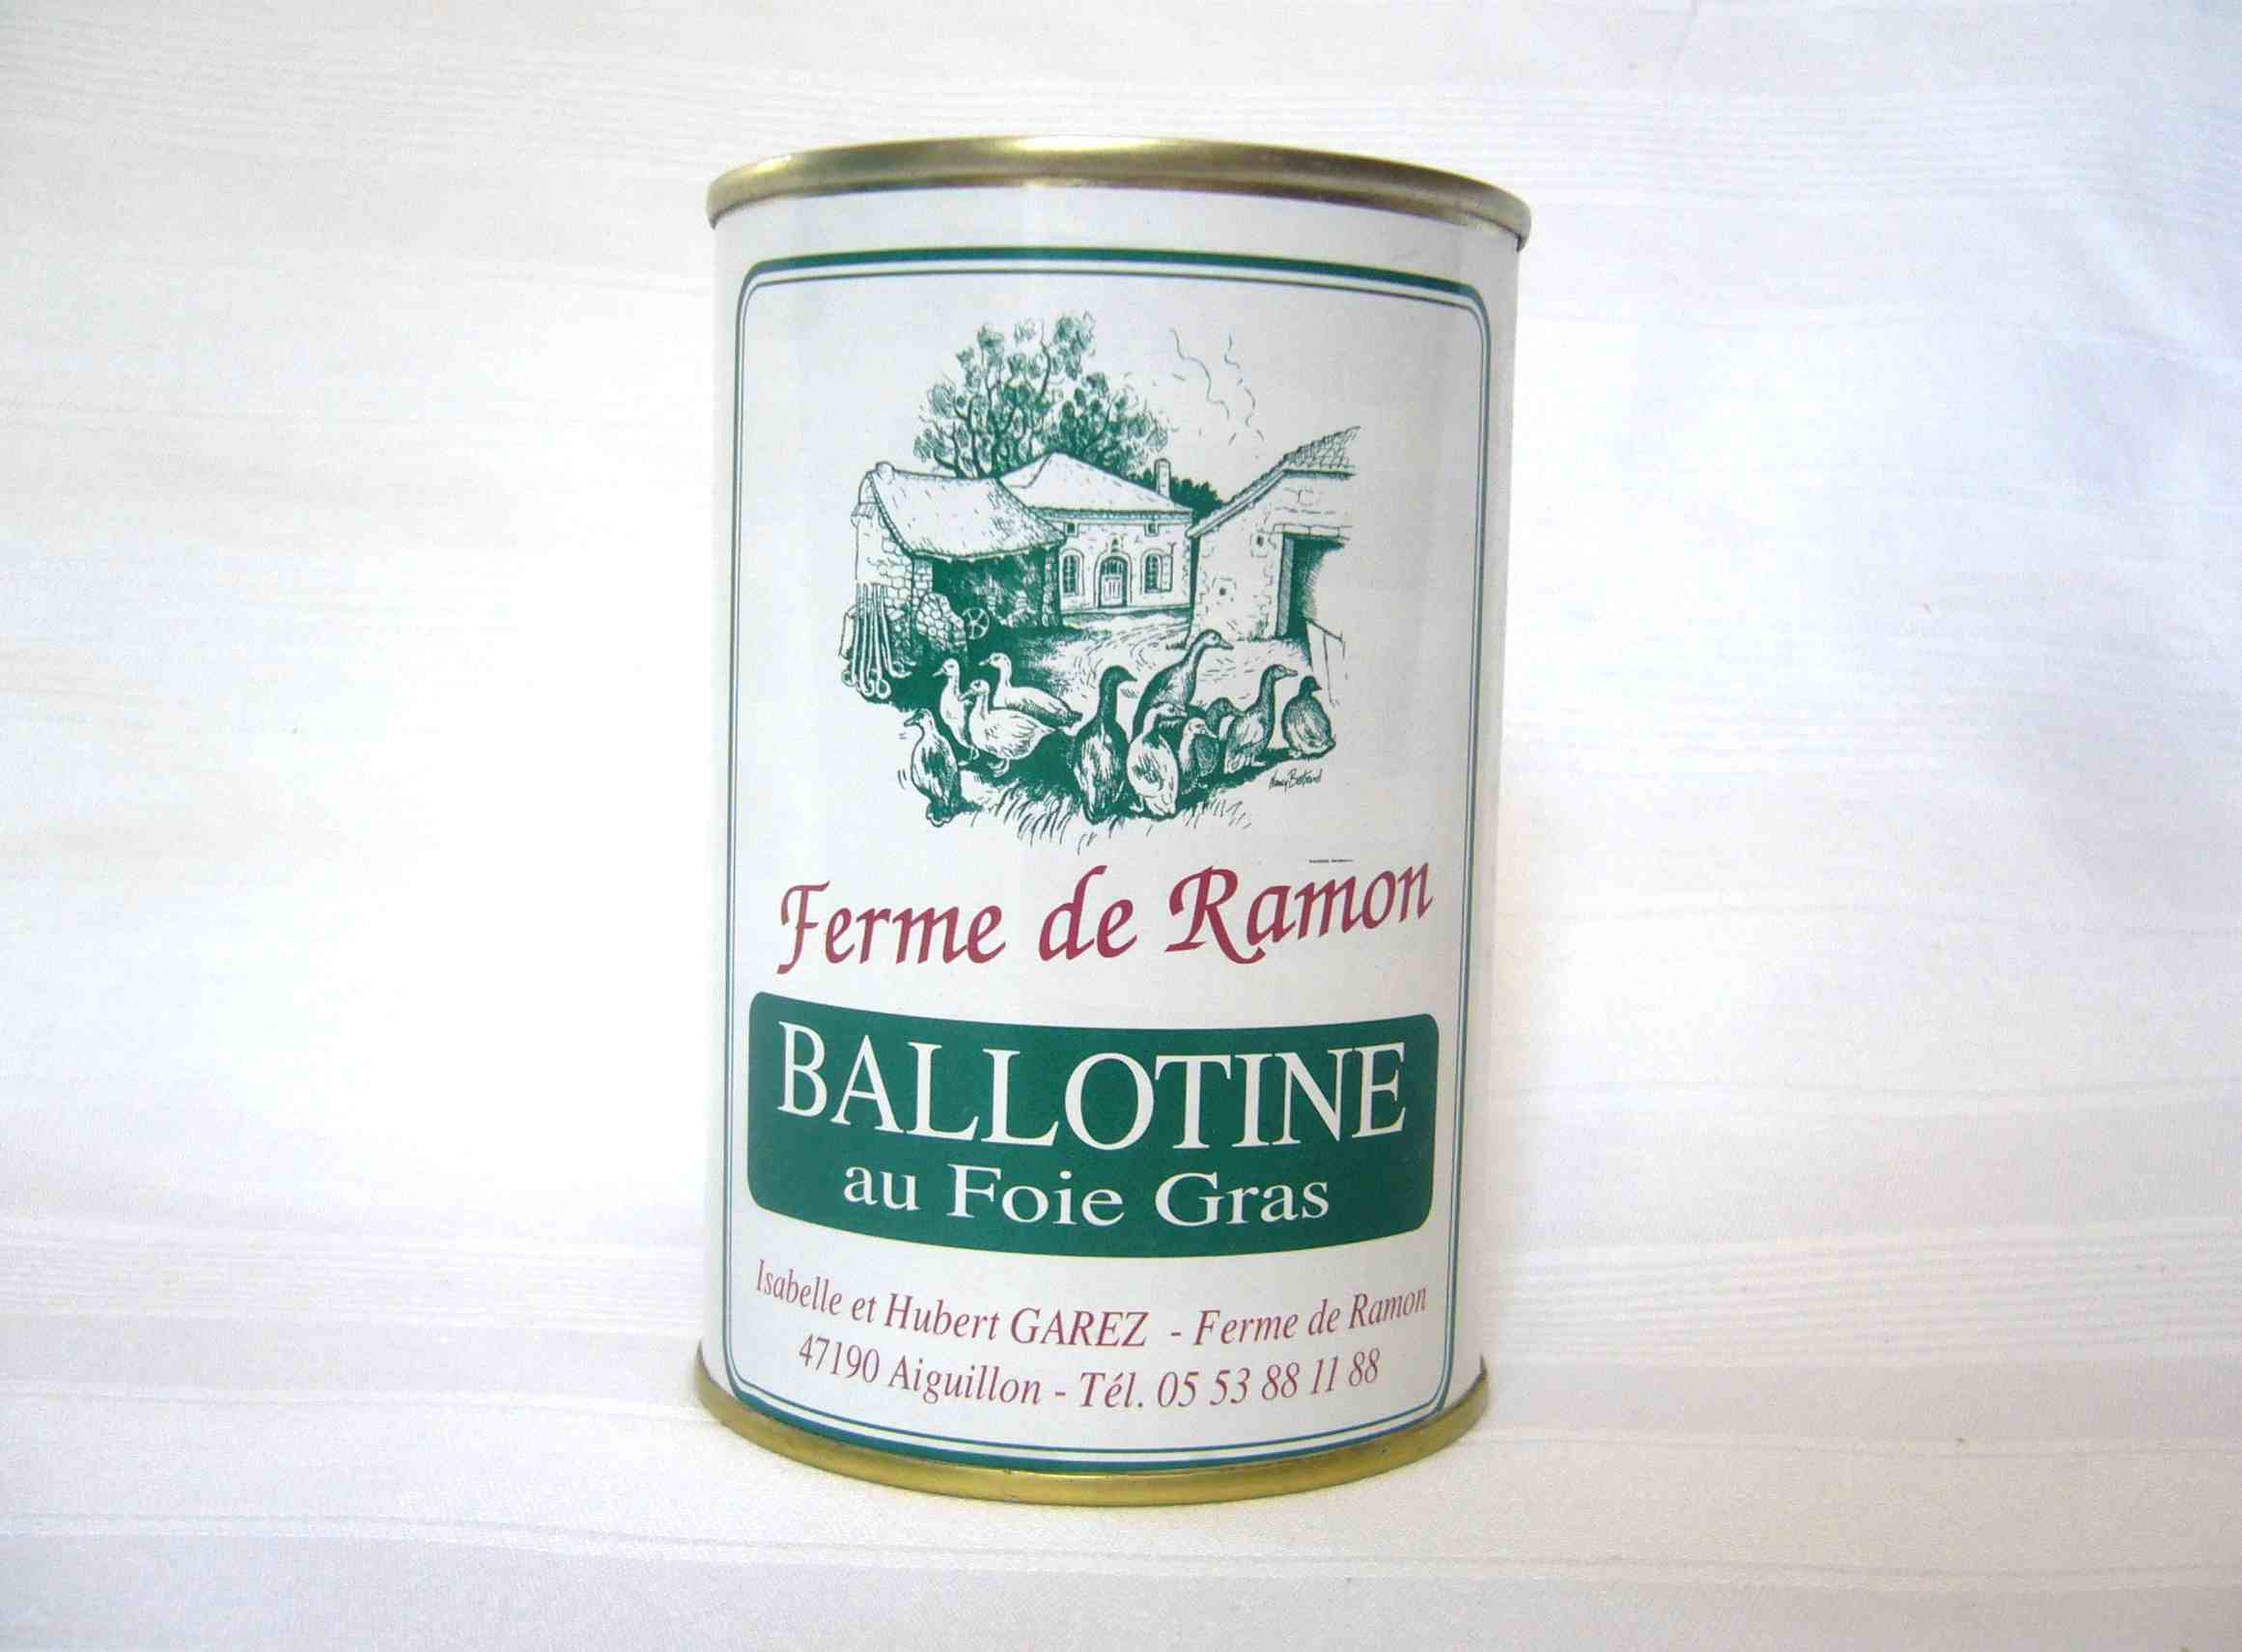 ballotine au foie gras ferme de ramon ferme de ramon. Black Bedroom Furniture Sets. Home Design Ideas